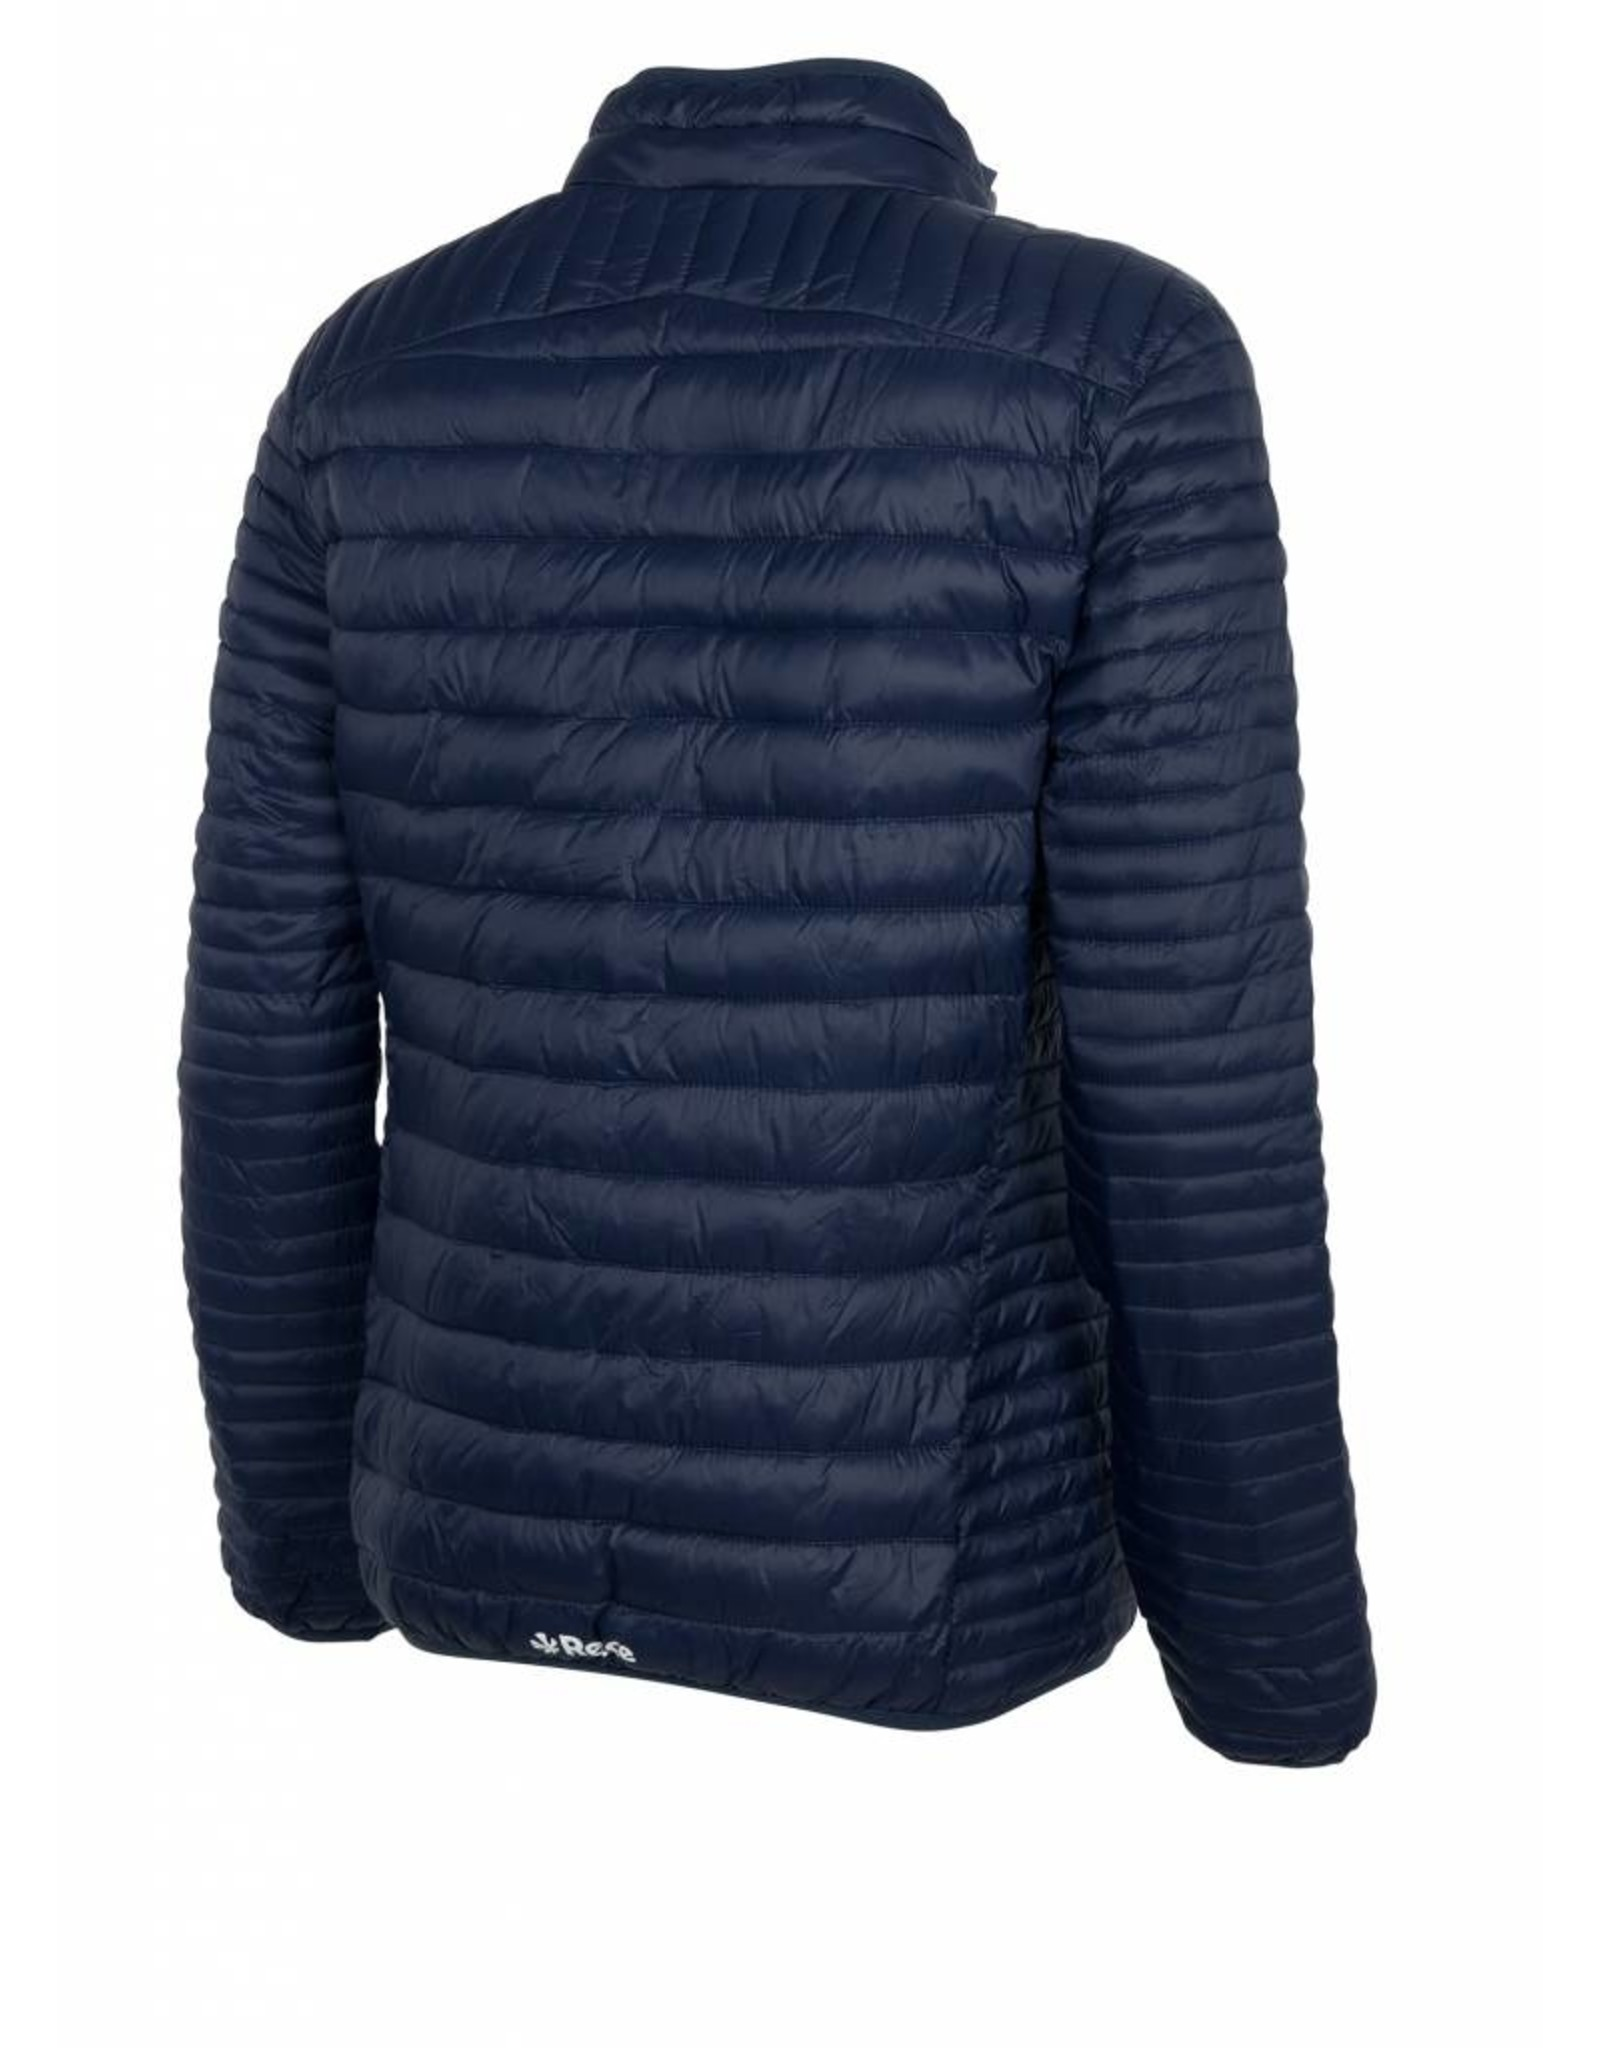 Reece Varsity Puffed Jacket Ladies